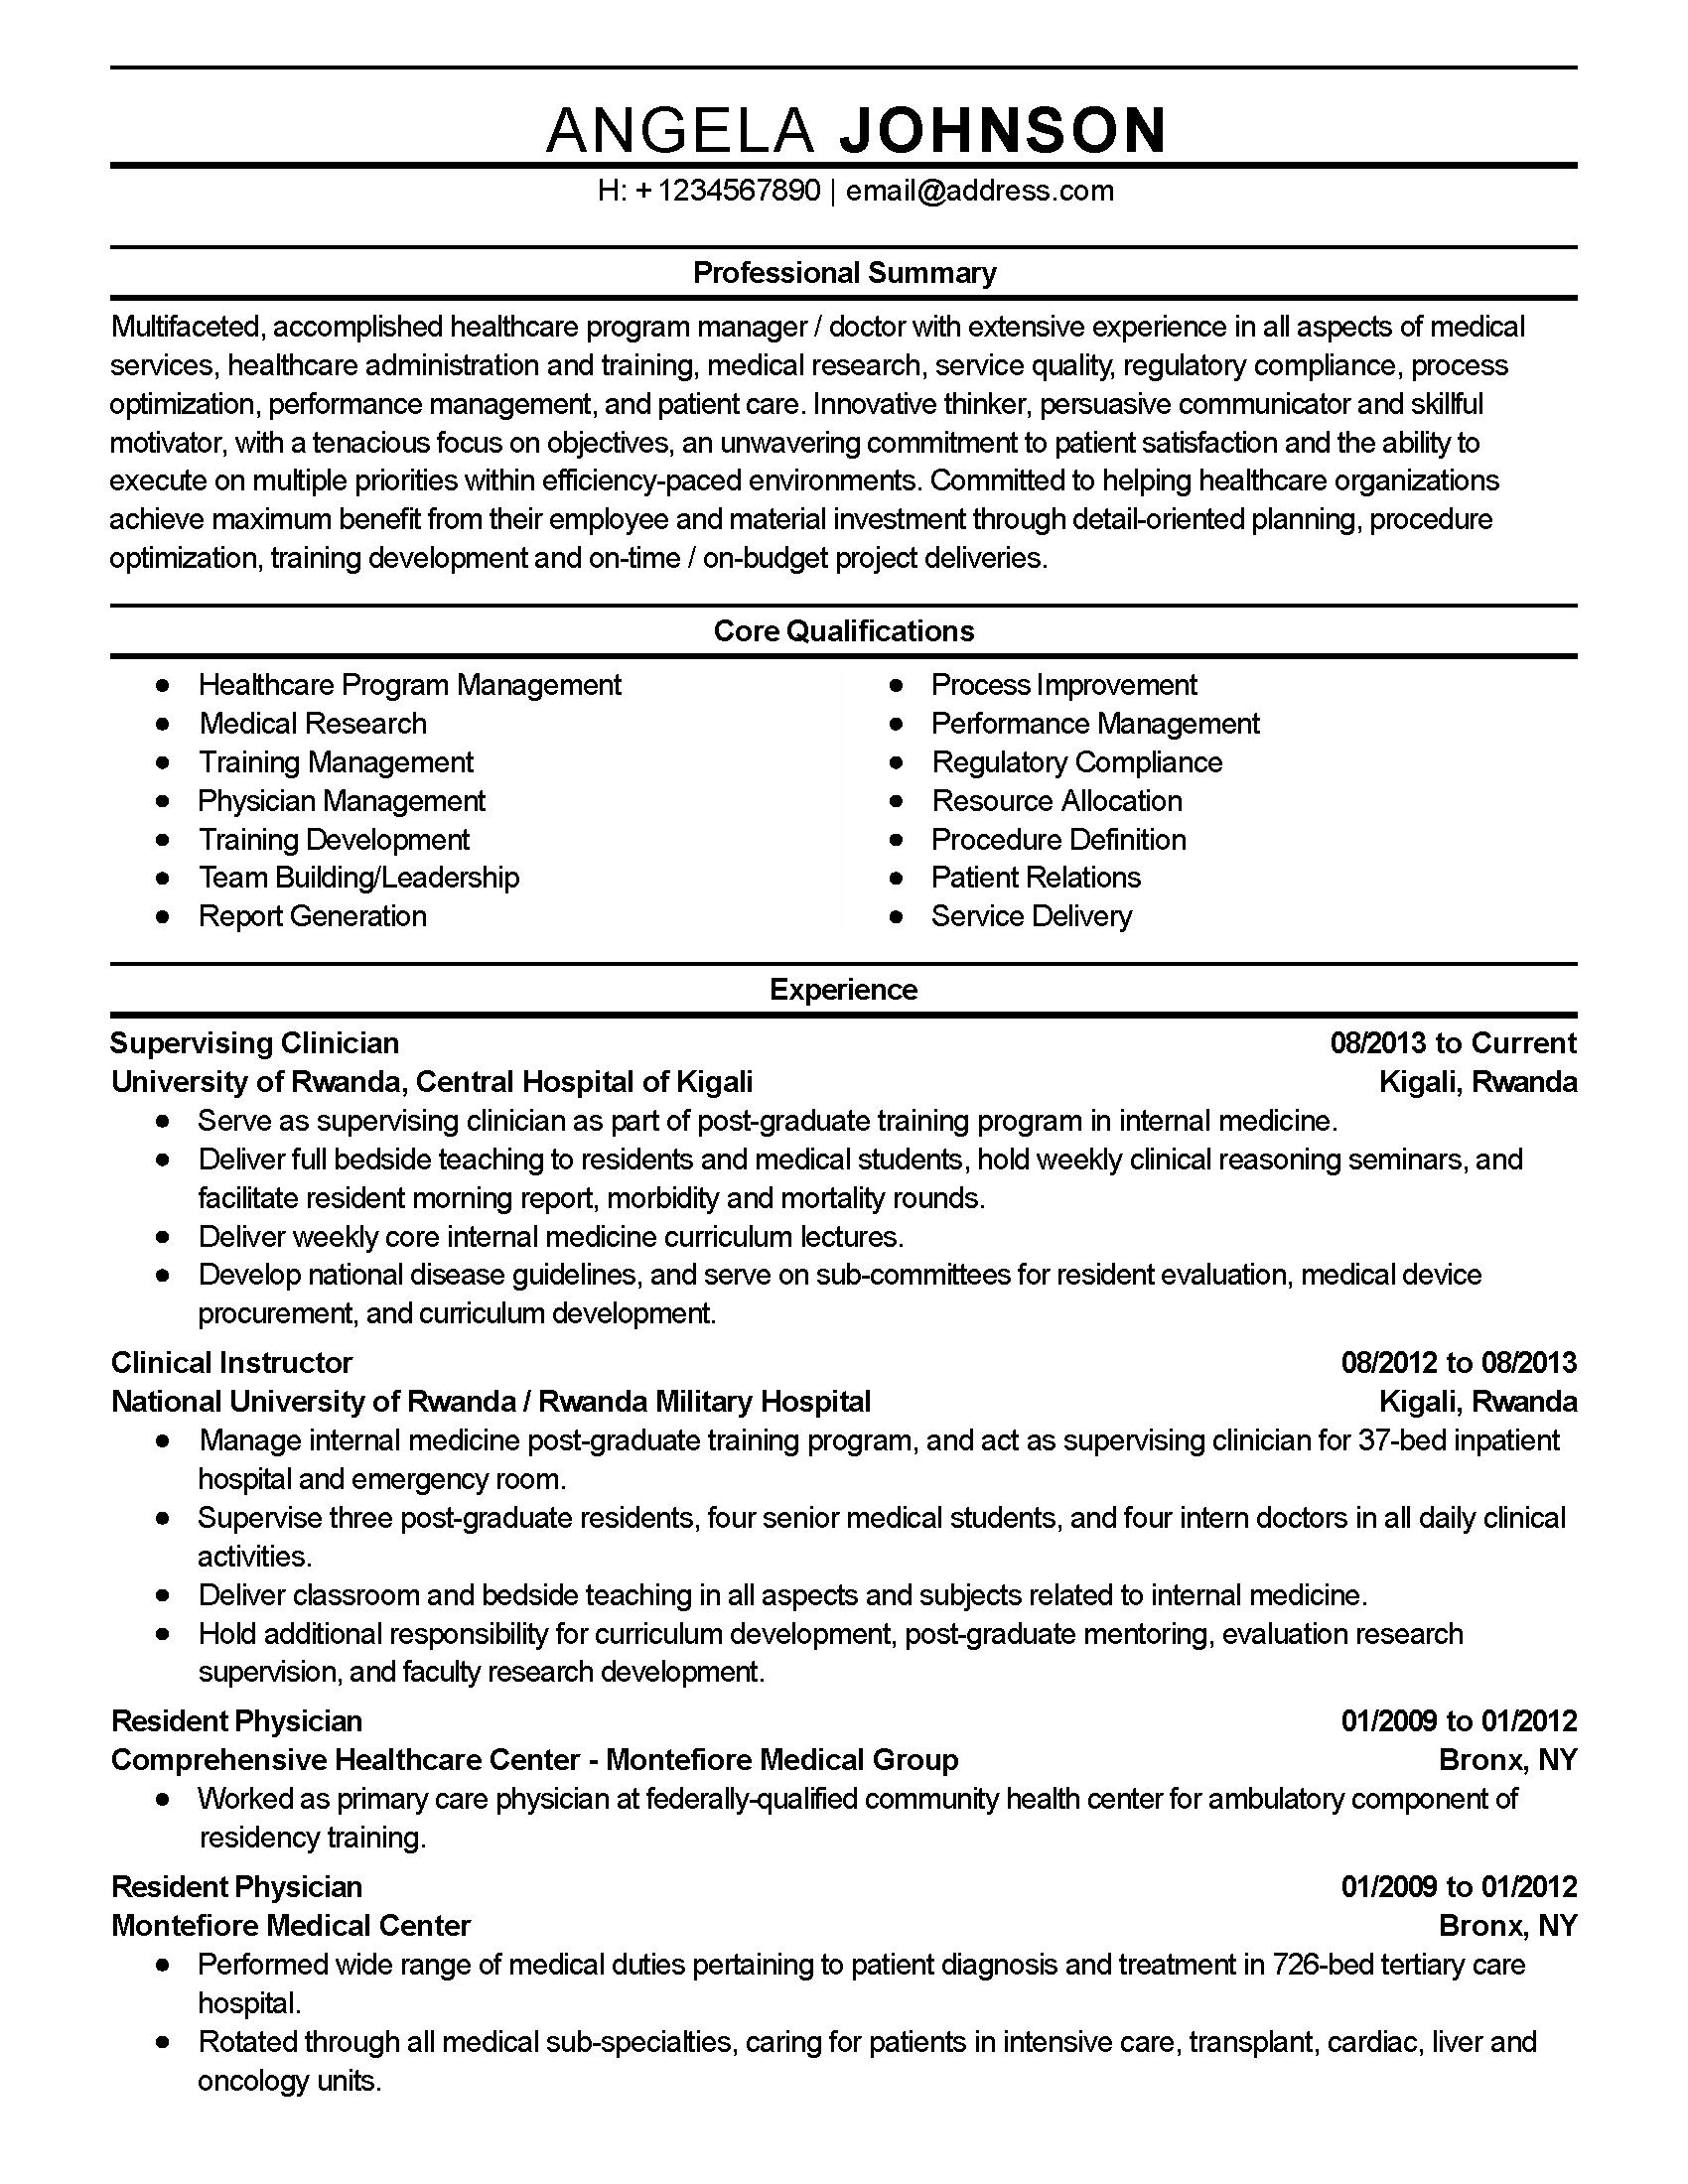 best resume format mis executive resume format examples best resume format mis executive mis executive resume sample executive resumes livecareer resume samples software knowledge